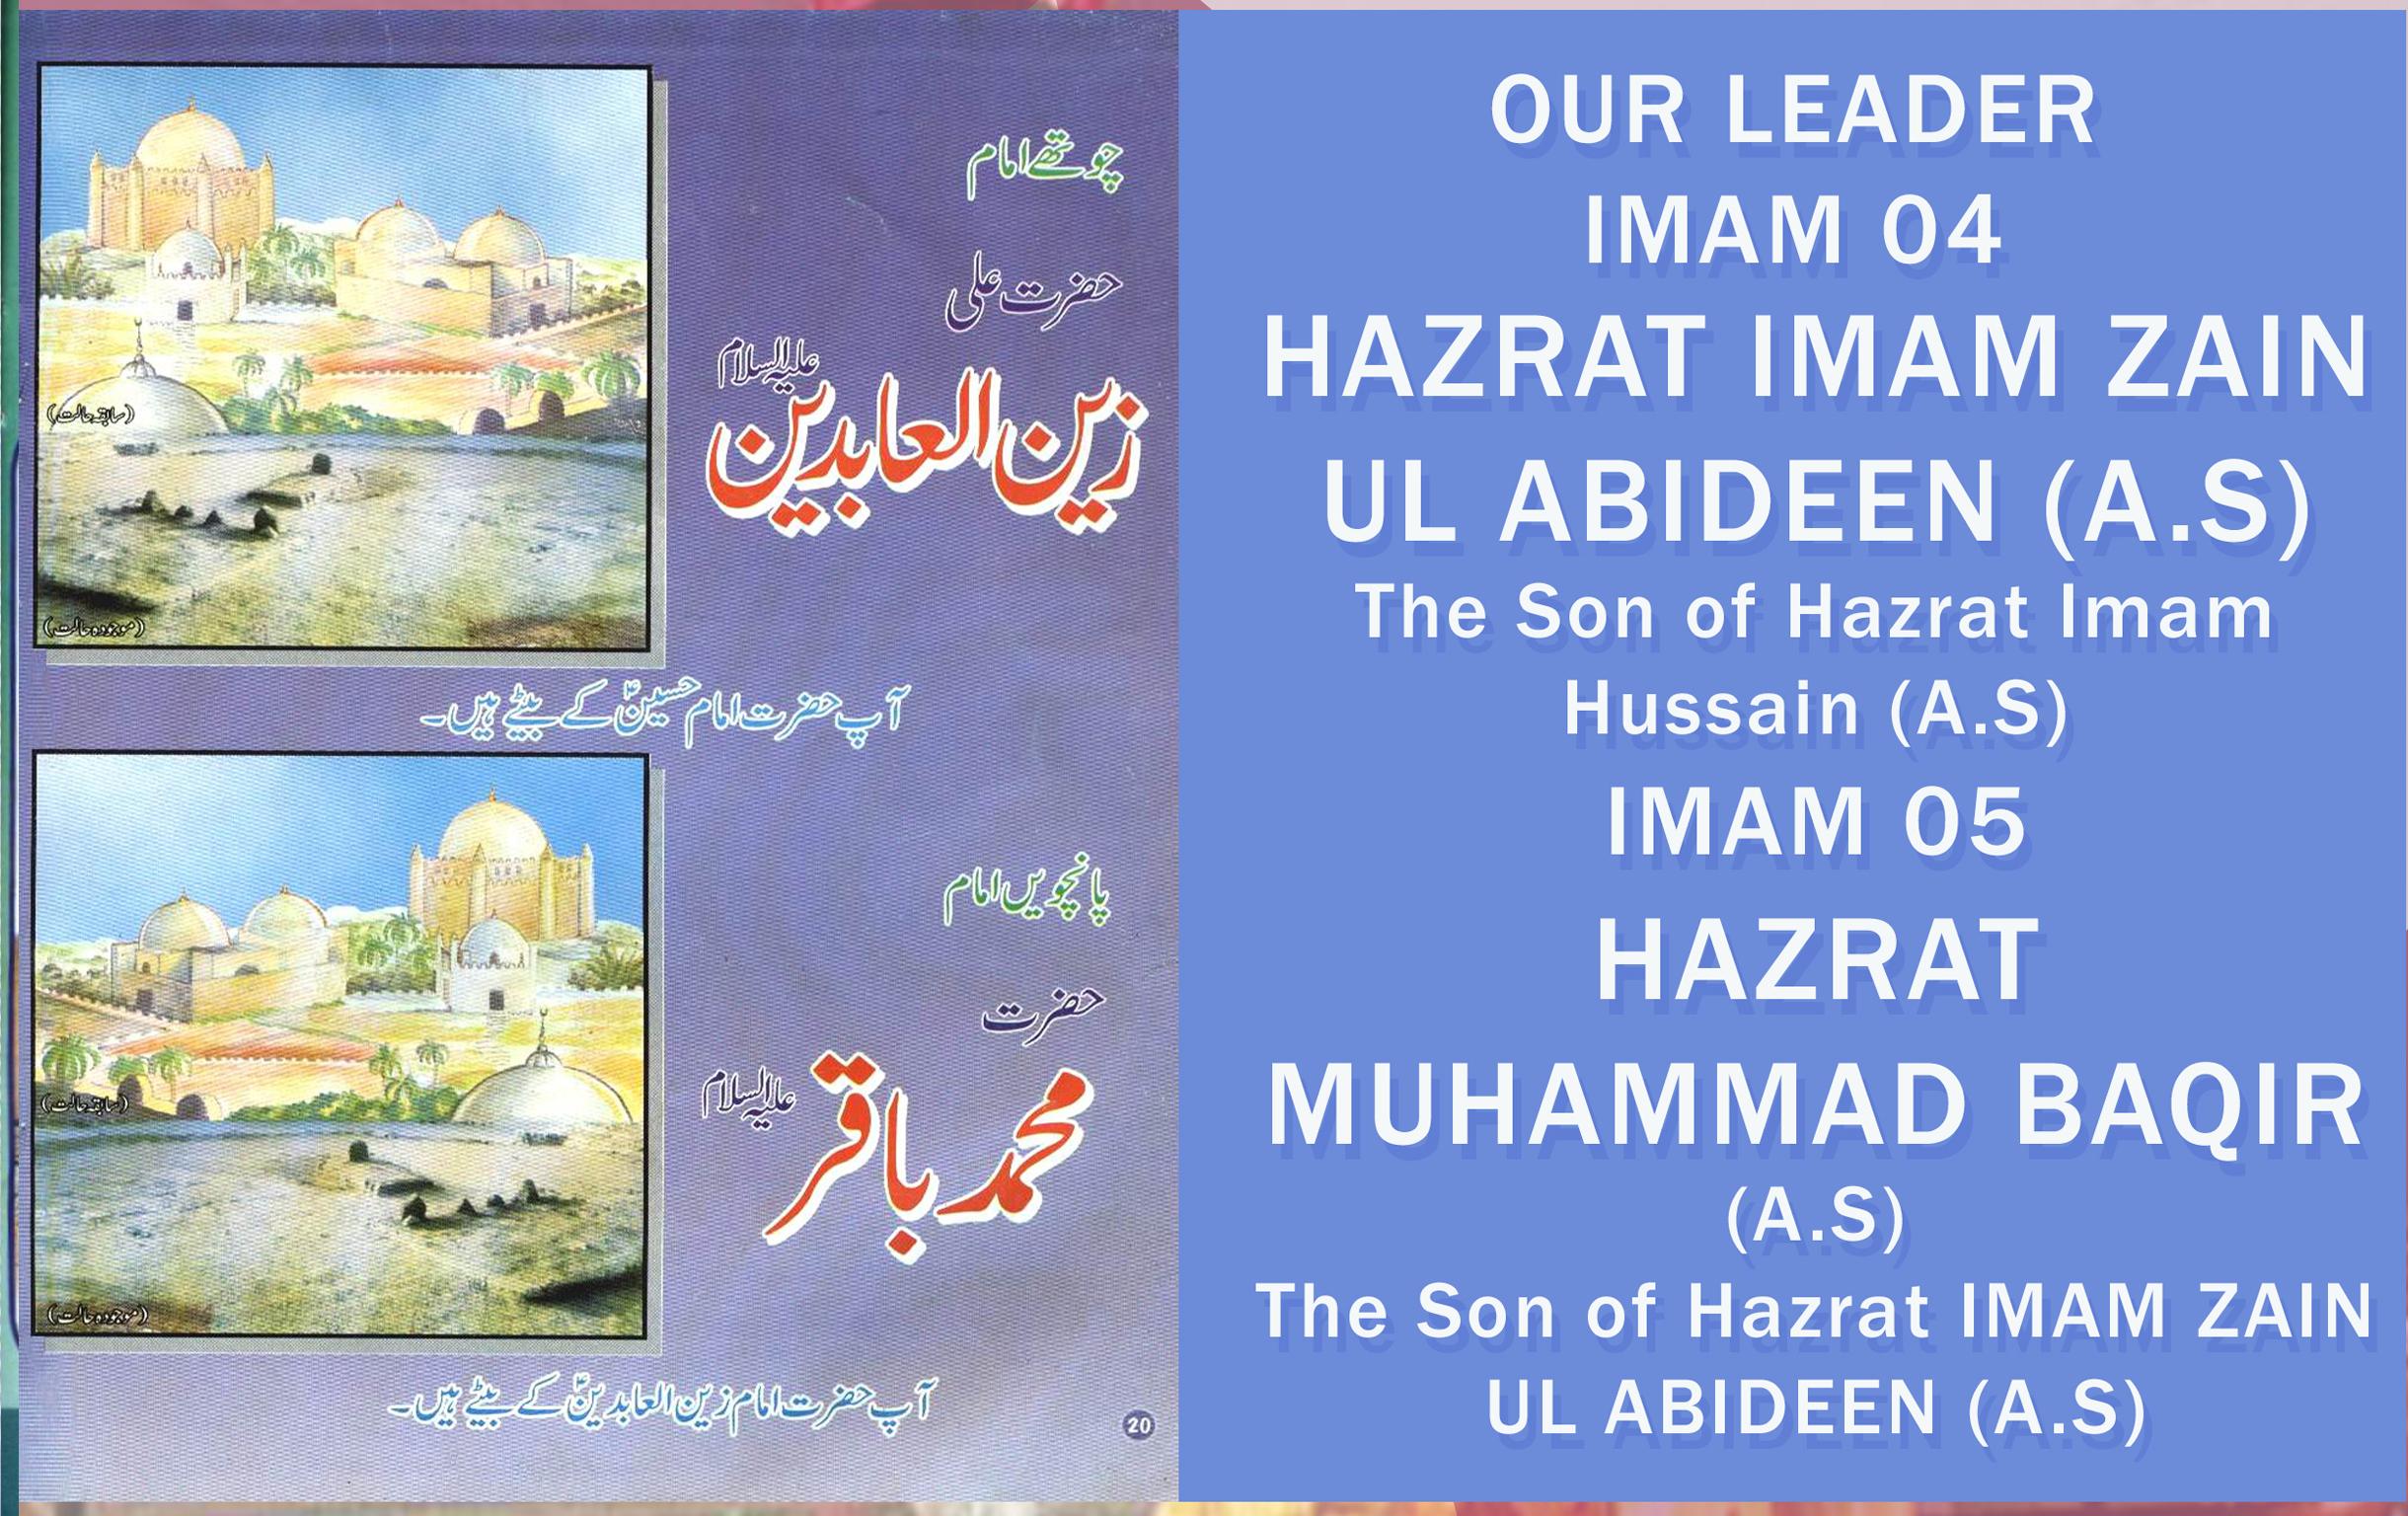 Hazrat Imam Zain ul Abideen A.S / Hazrat Imam Muhammad Baqir A.S